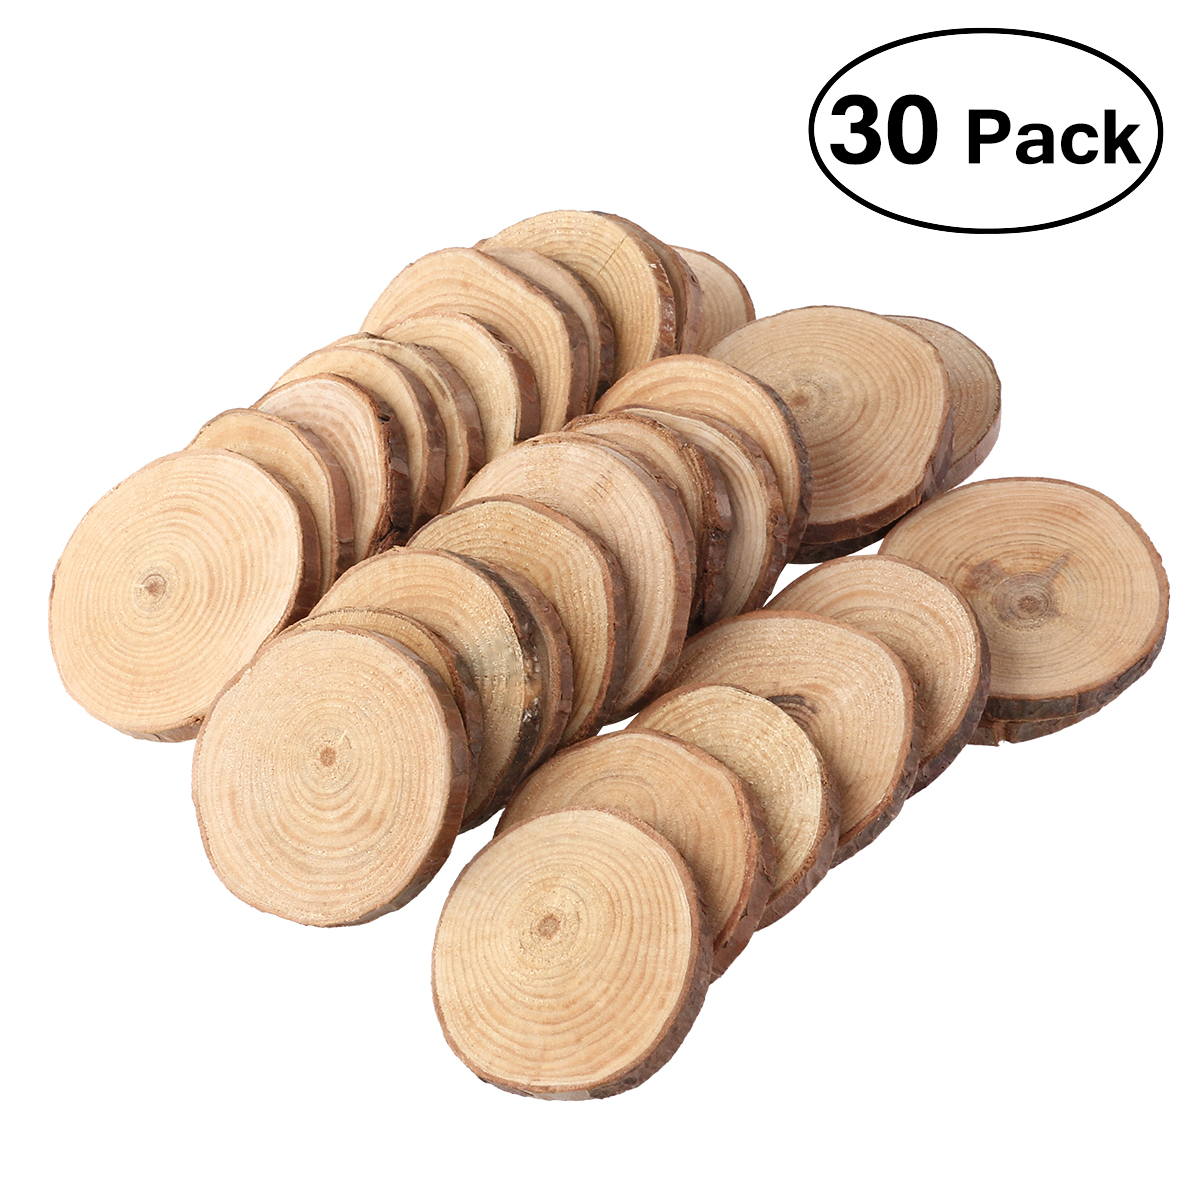 30pcs Wood Log Slices Discs Cutout Circle Round Wooden Disks Crafts Paint Decor Wooden For Wedding DIY Decoration